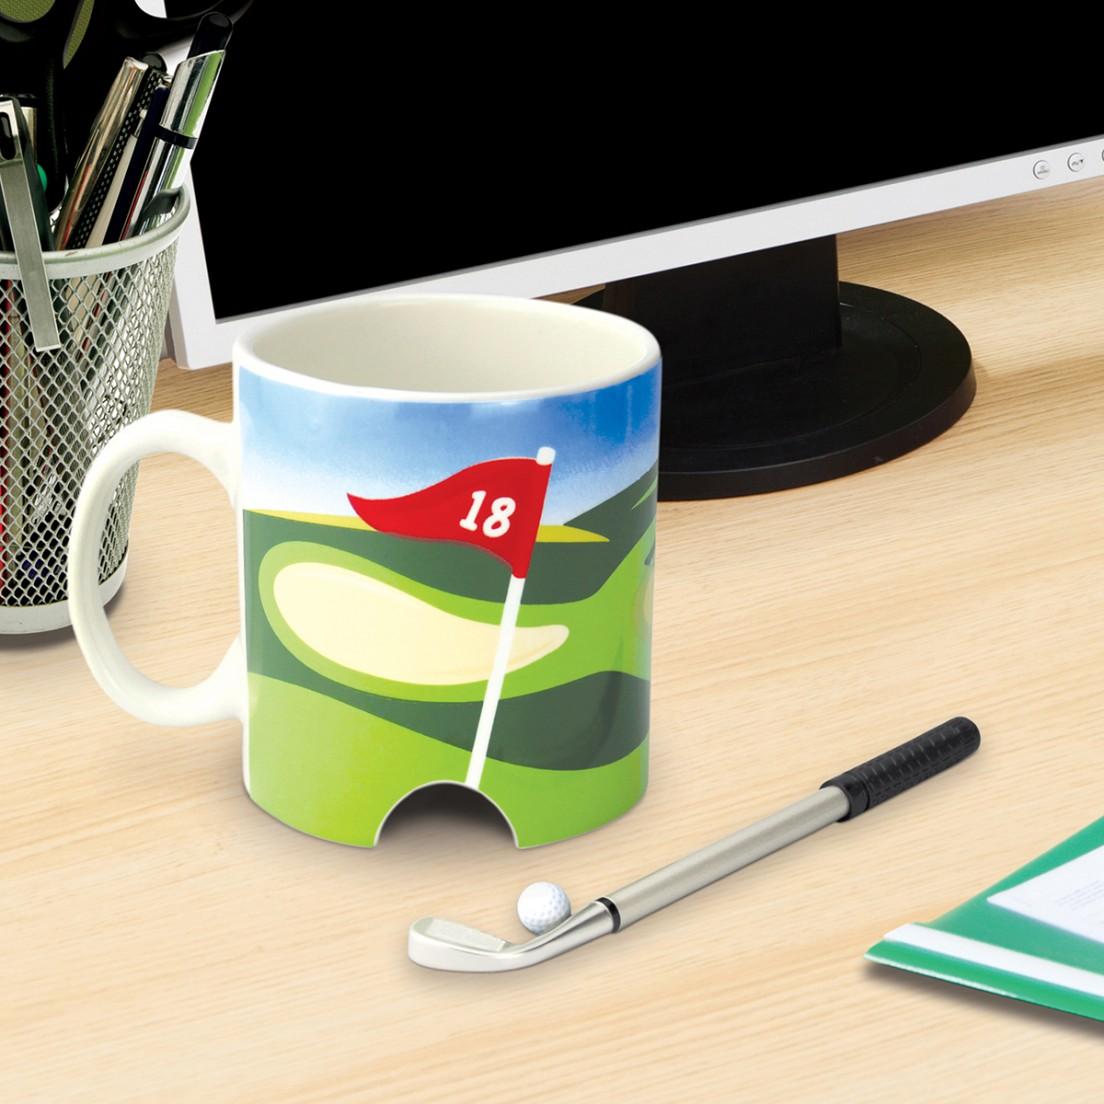 golf-mok-om-te-putten-in-de-pauze-cadeautjes-nl_6382-62d7c9e4.jpg